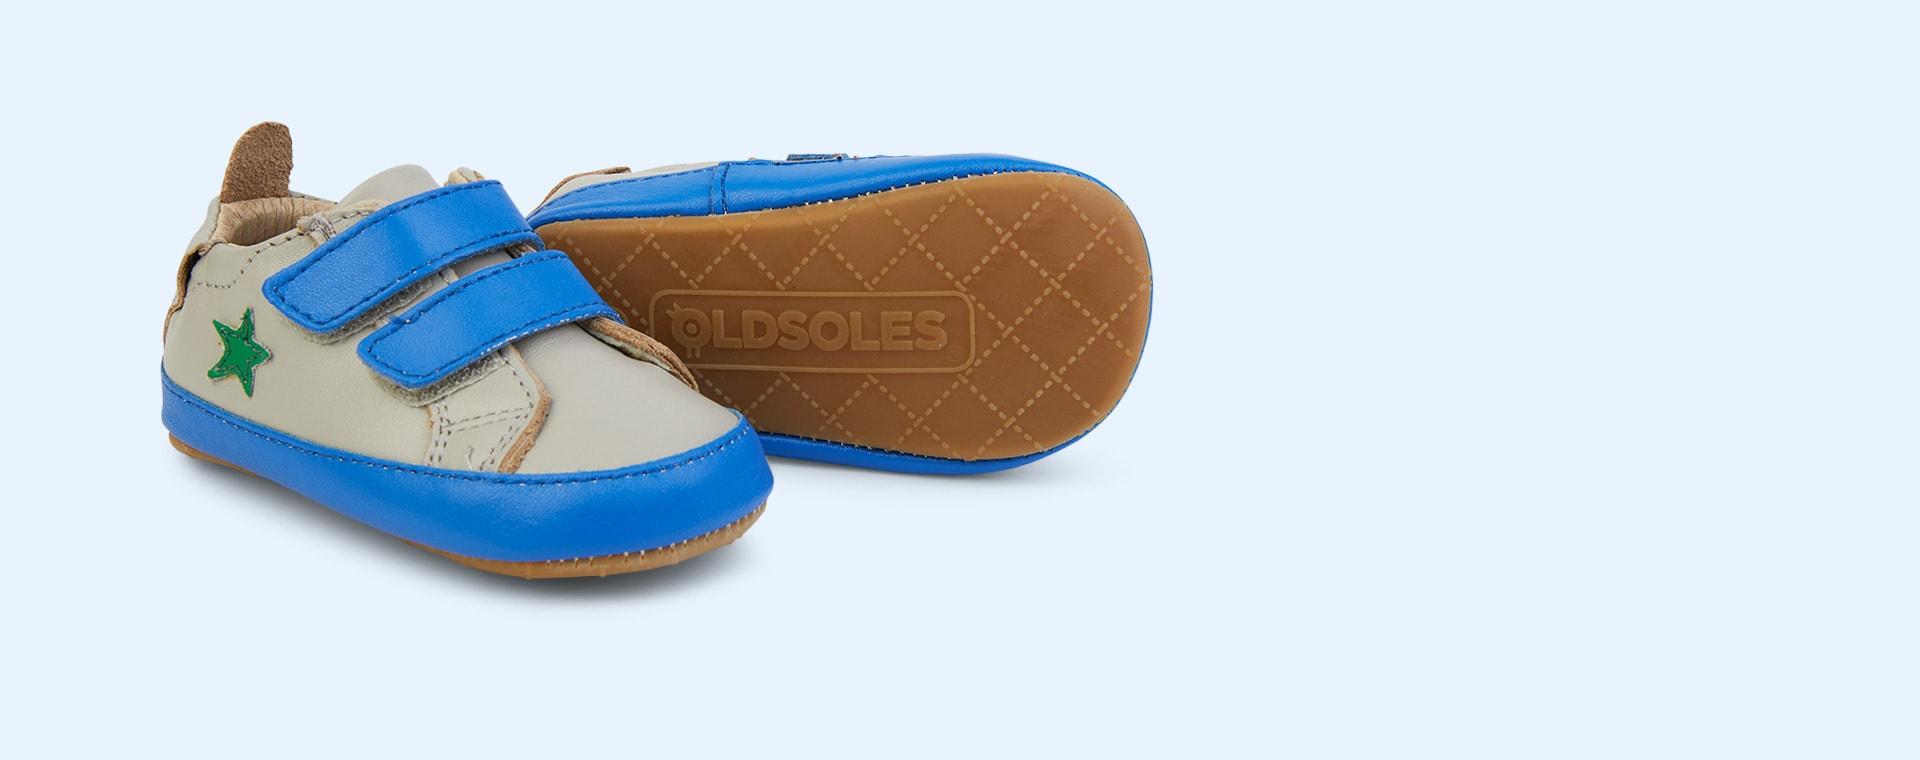 Gris/ Neon Blue/Neon Green old soles Star Market